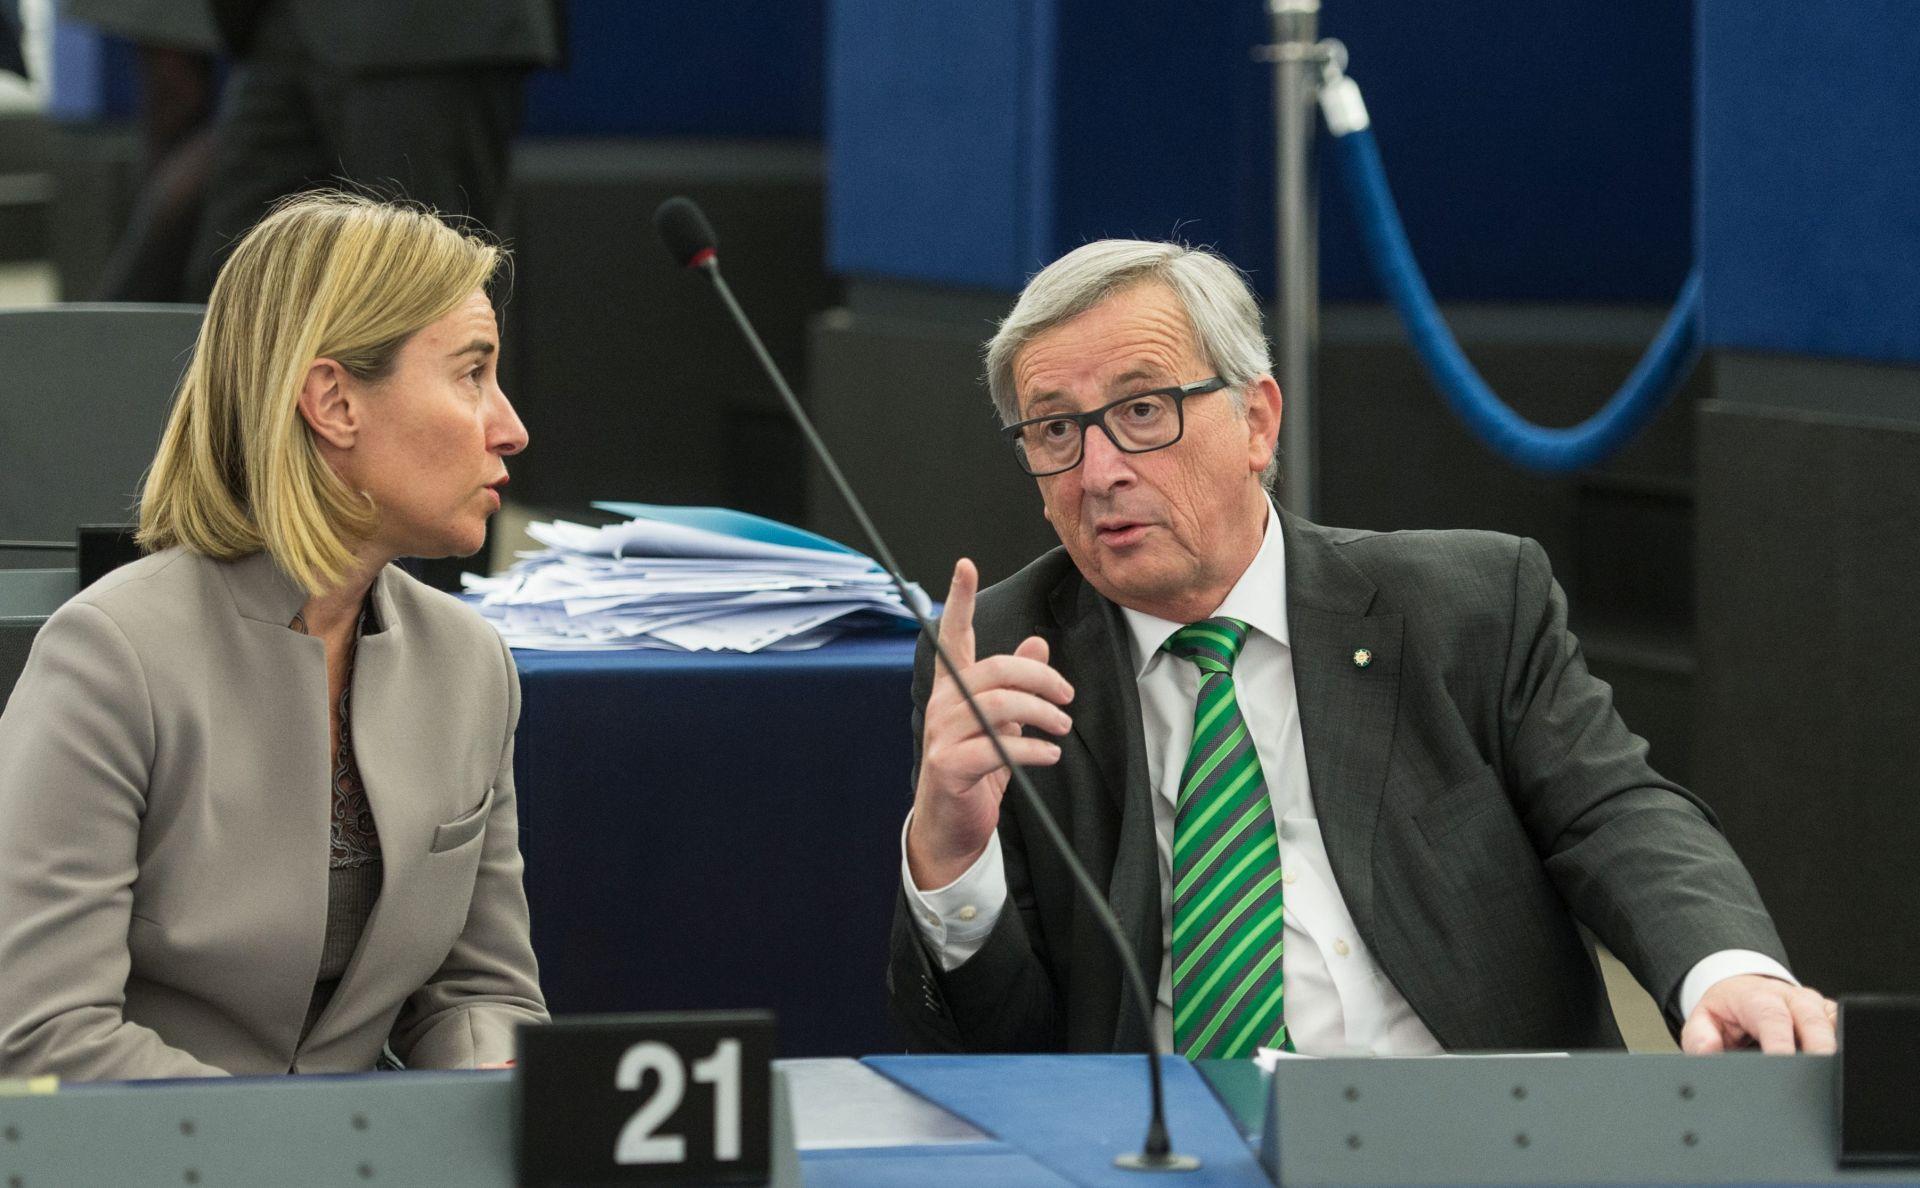 BEOGRAD Juncker i Hahn o Strategiji EU za zapadni Balkan